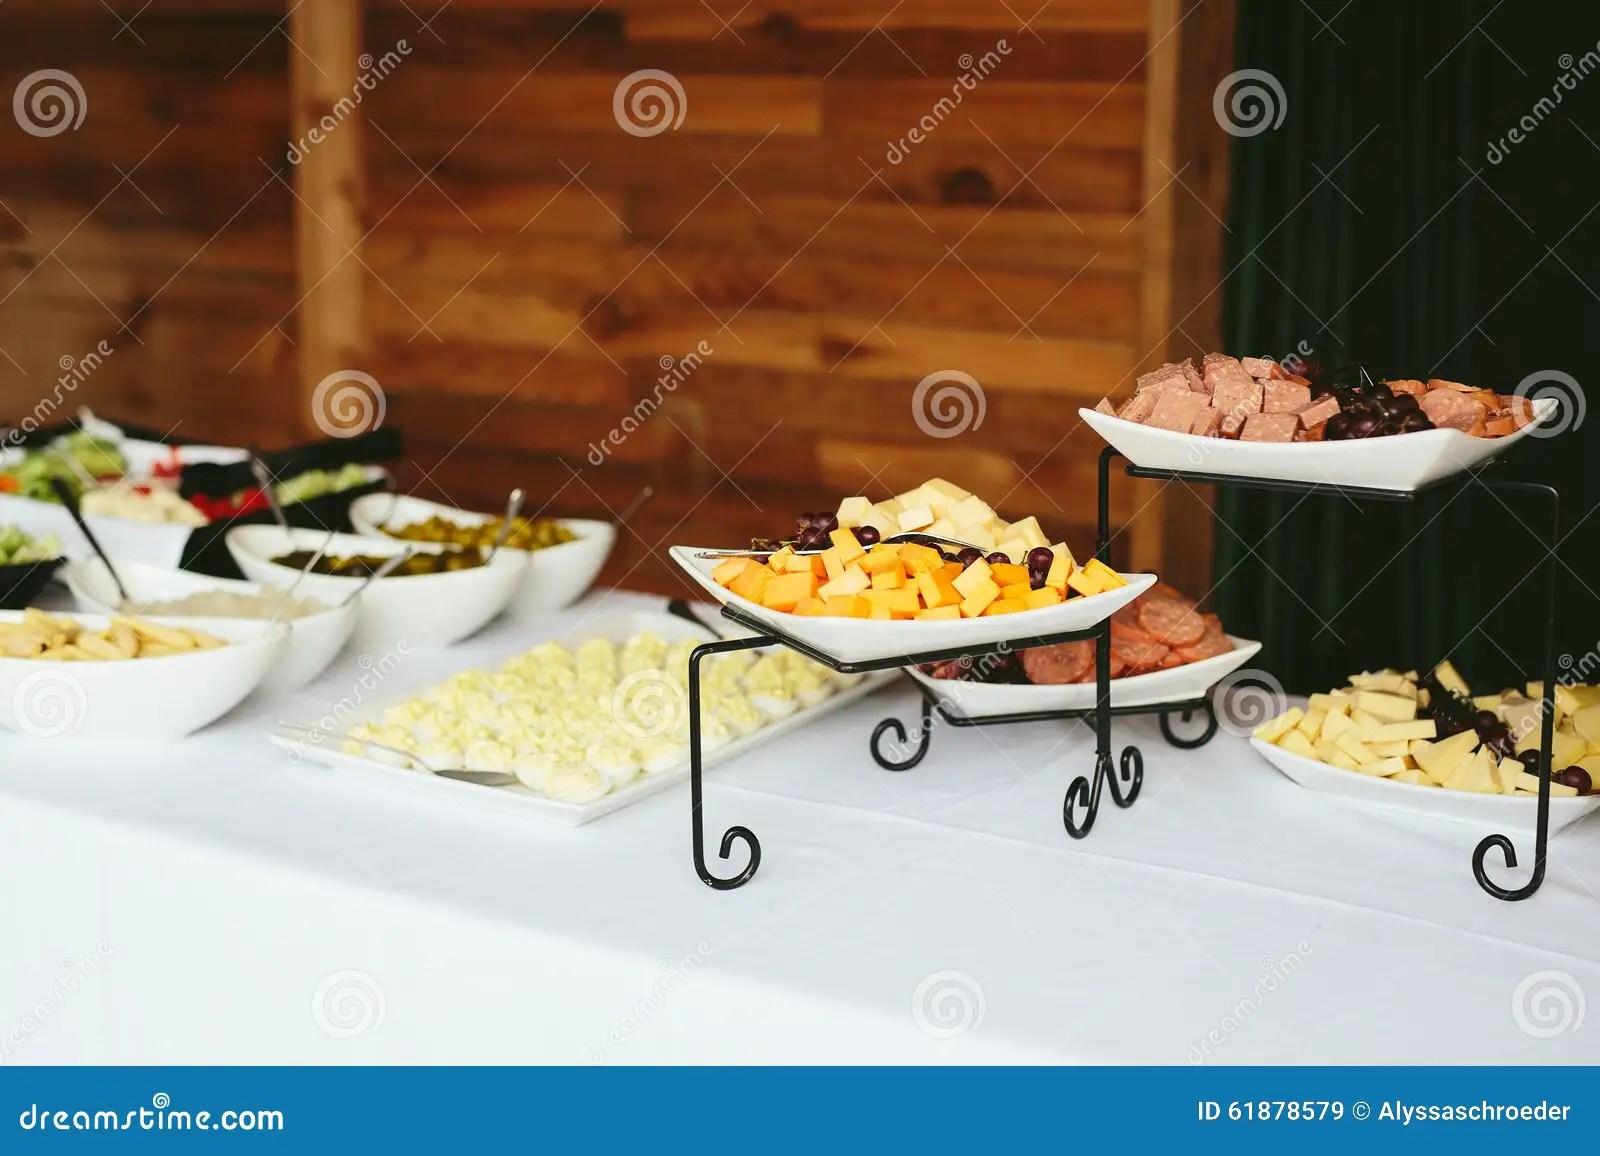 Wedding Reception Dinner Food Buffet Stock Photo Image